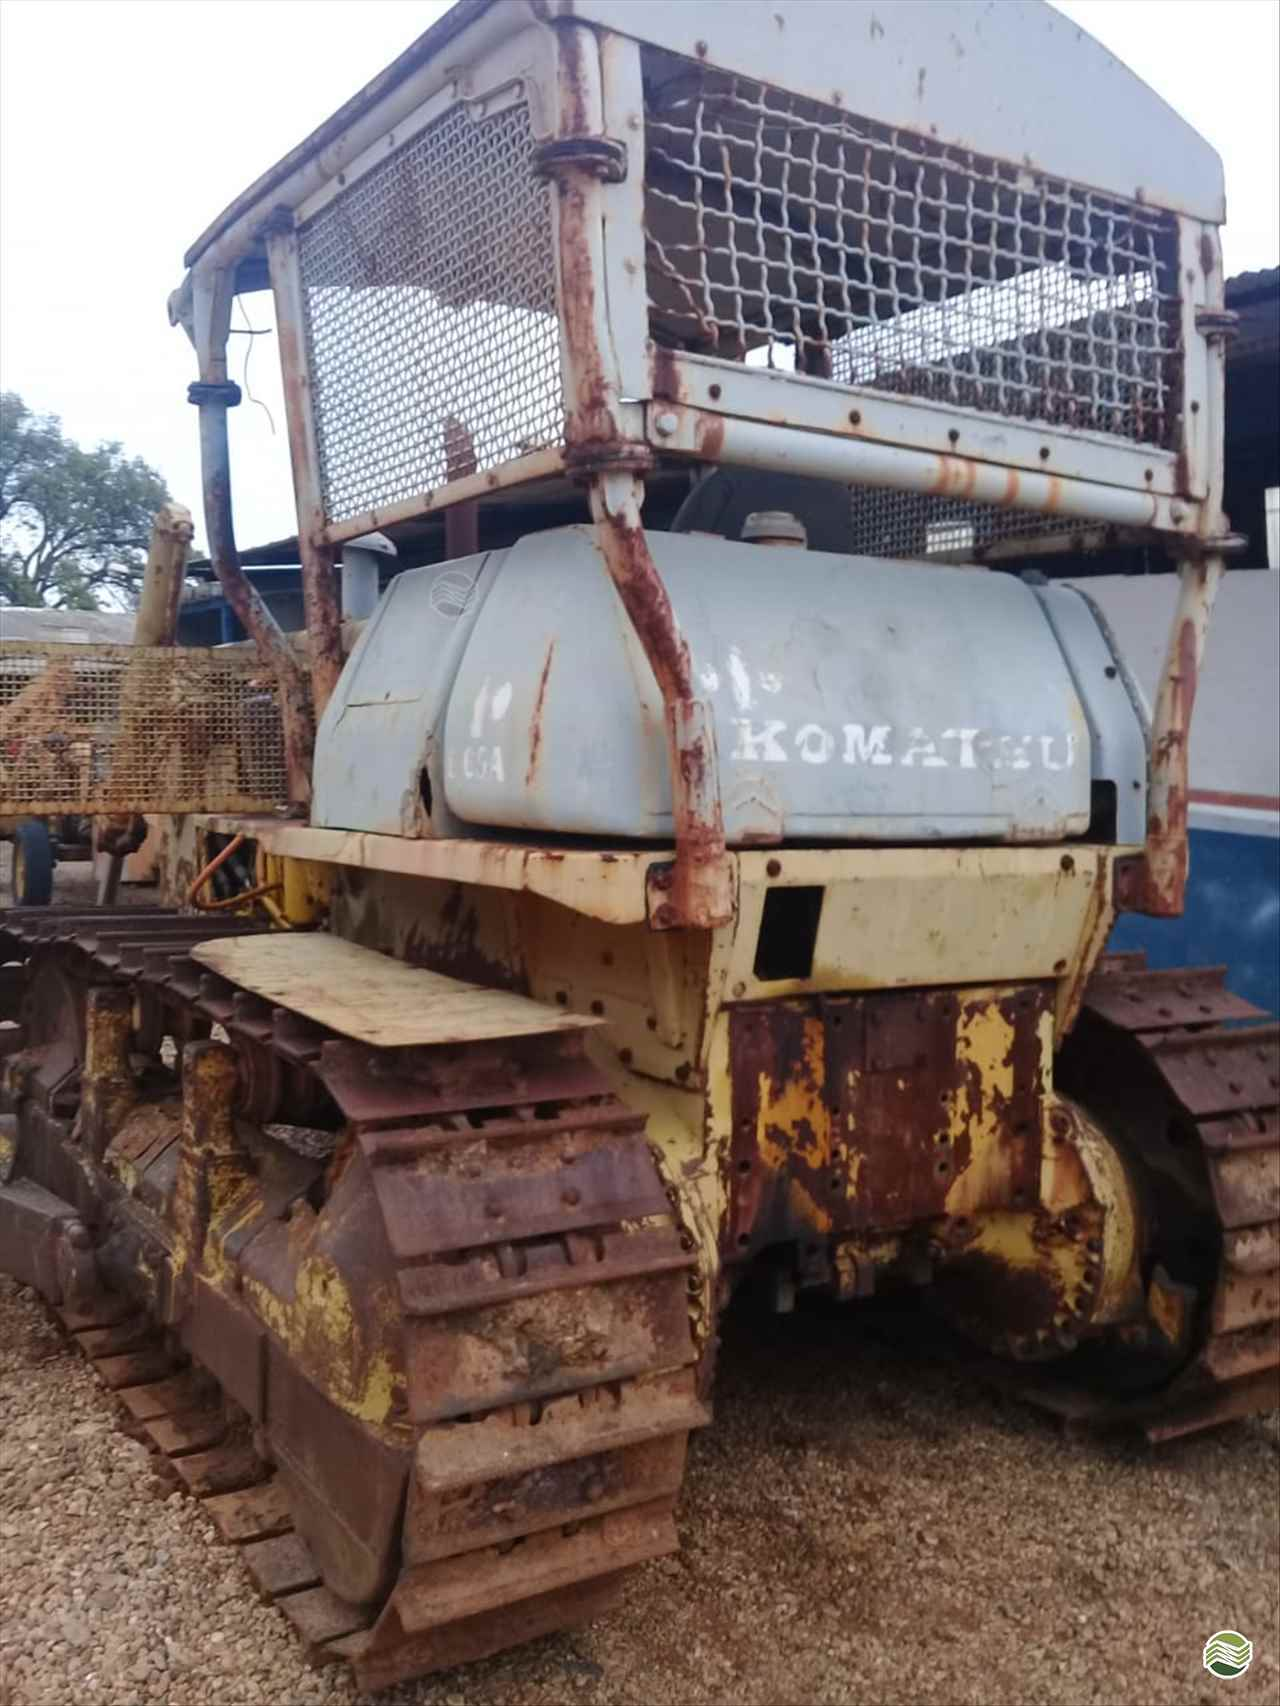 KOMATSU D65  1987/1987 Souza Neto Tratores e Implemento